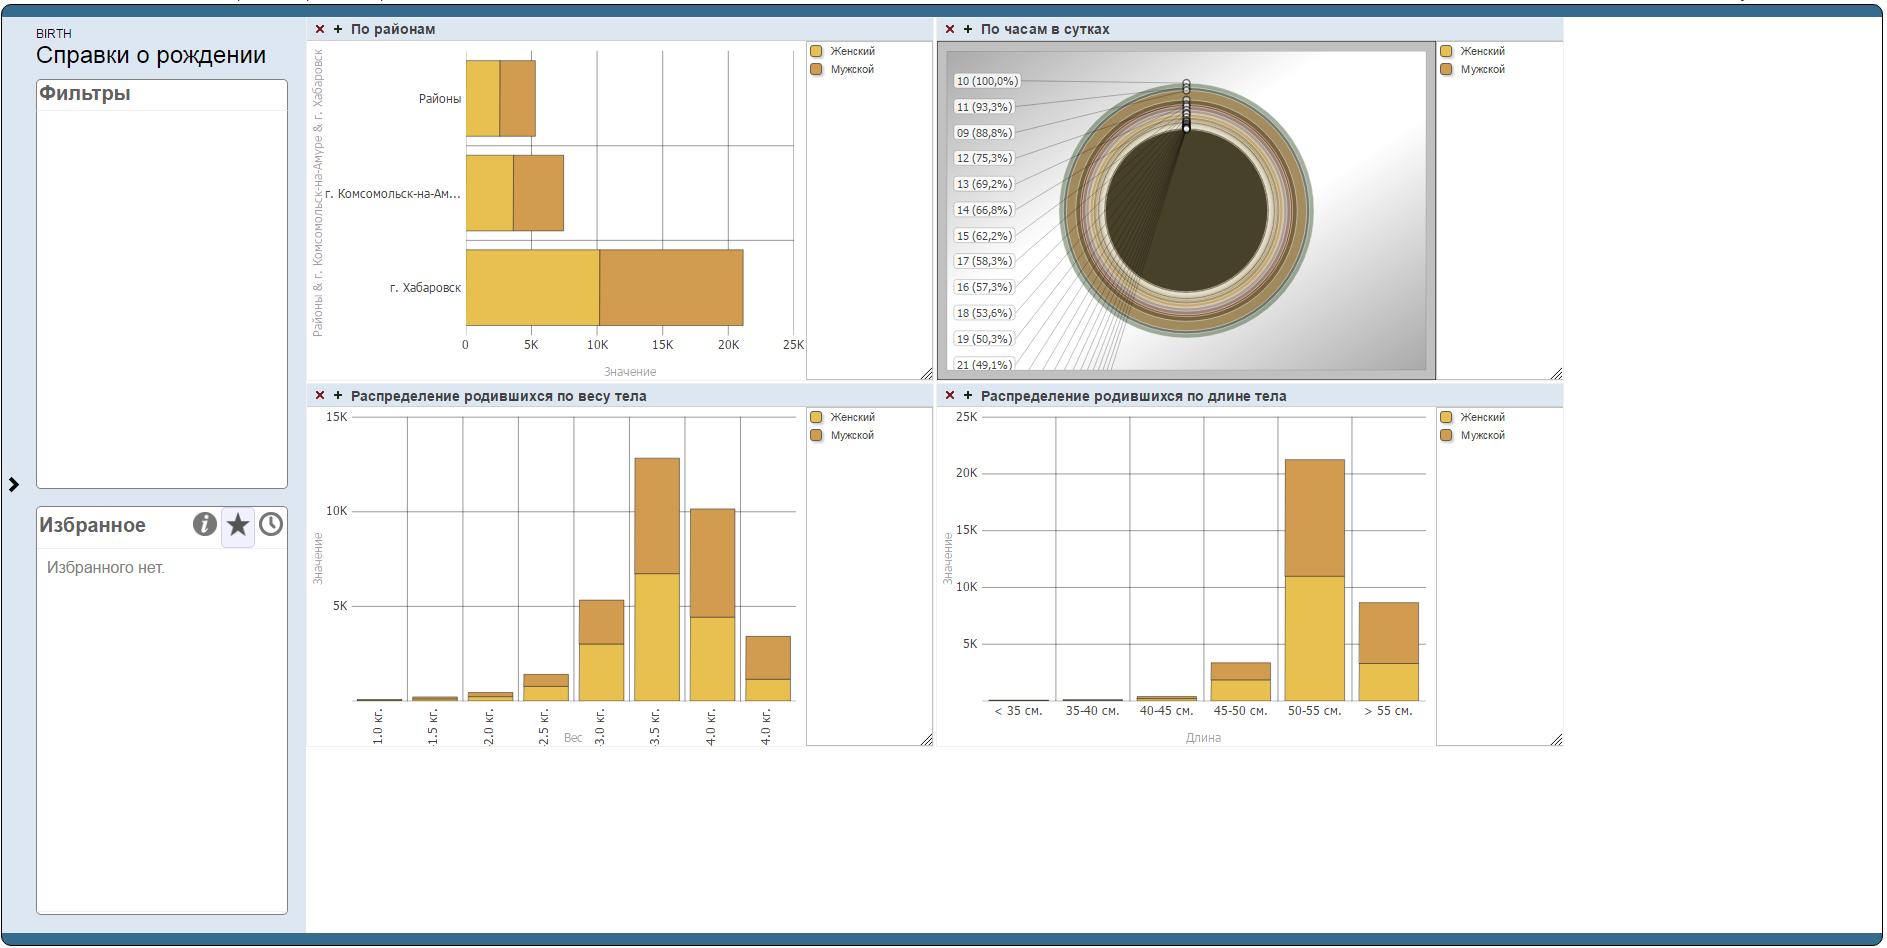 Intersystems DeepSee. Простая и быстрая визуализация данных - 1